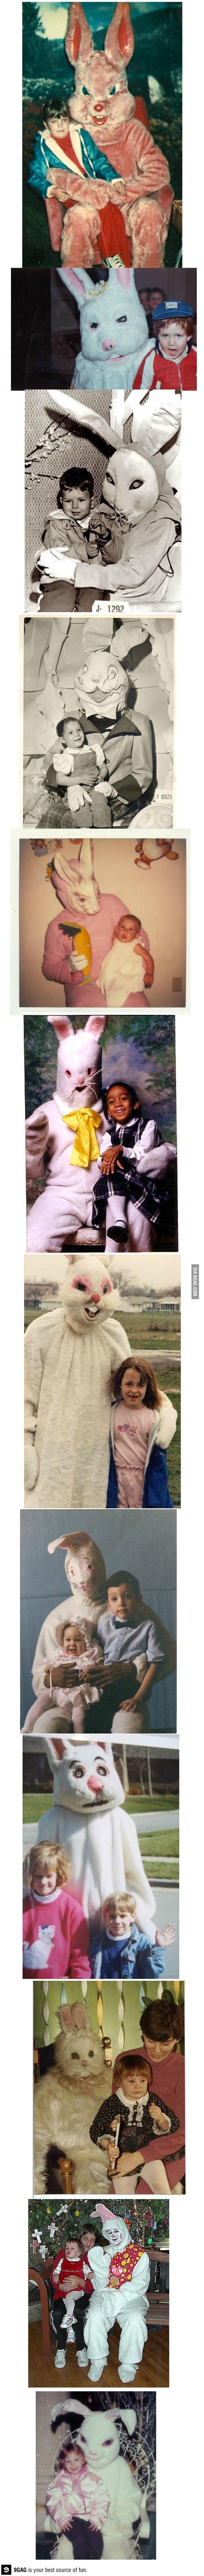 best 25 easter bunny pics ideas on pinterest easter bunny